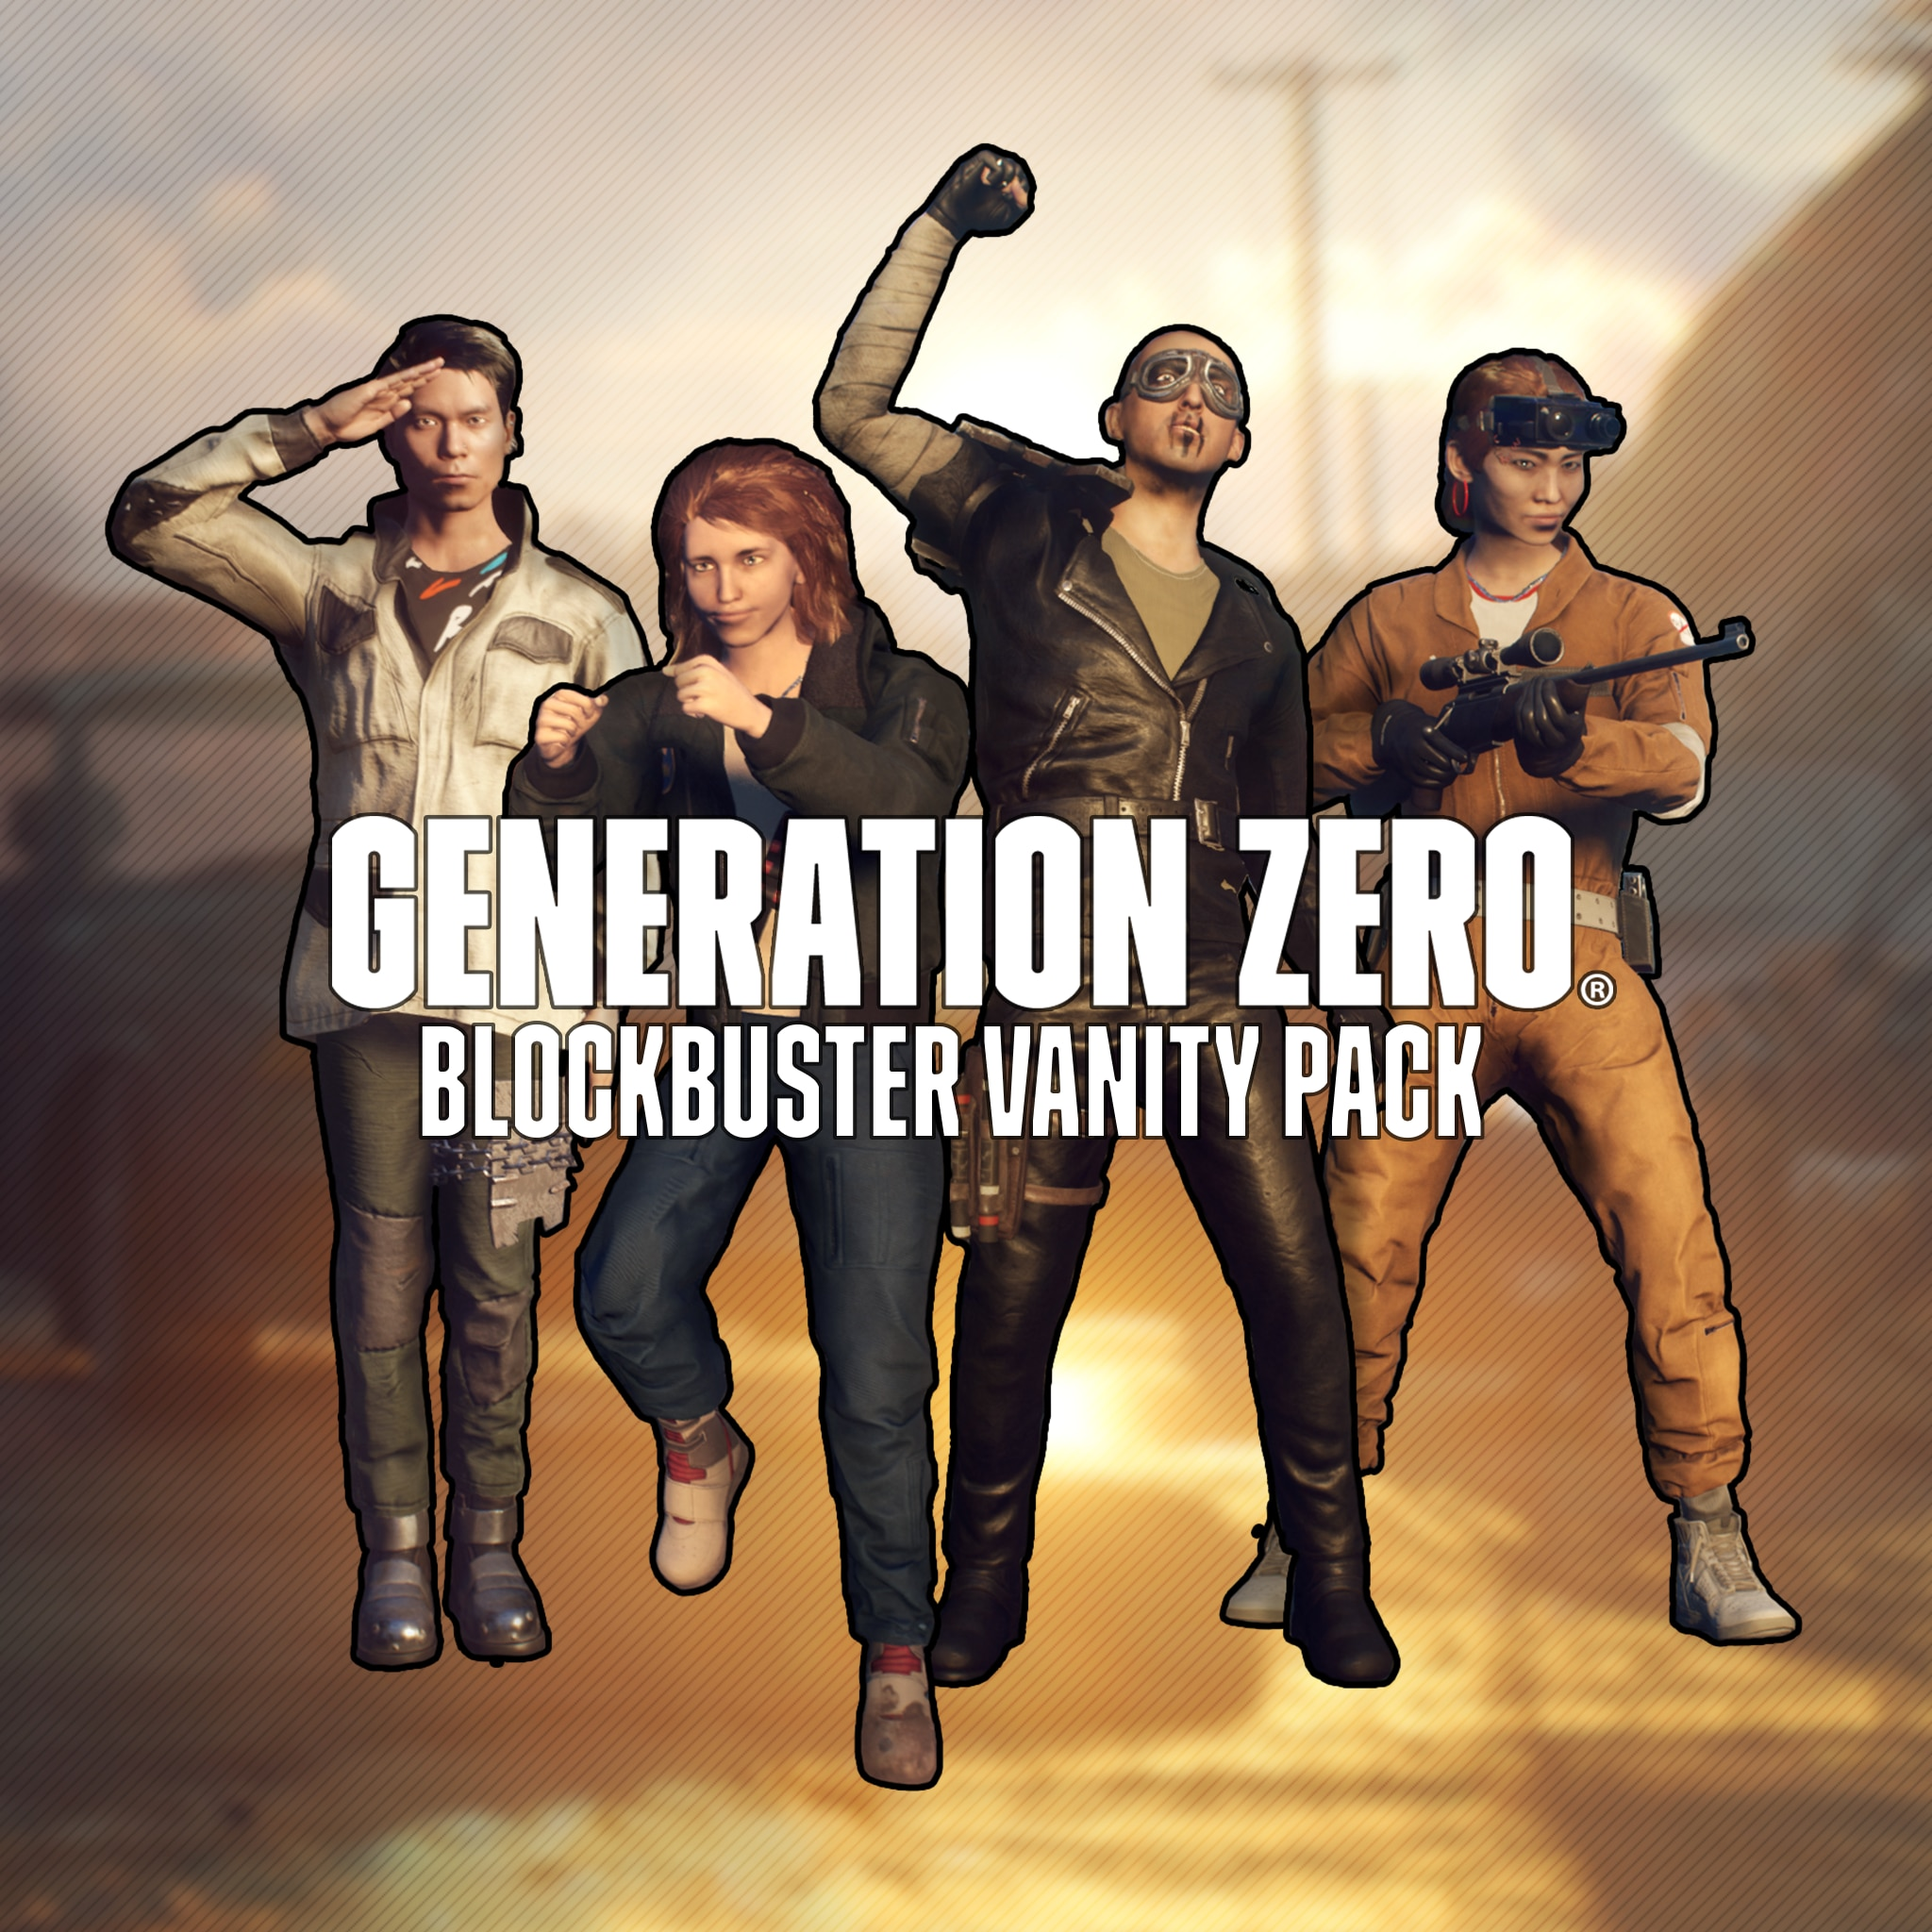 Generation Zero® - Blockbuster Vanity Pack